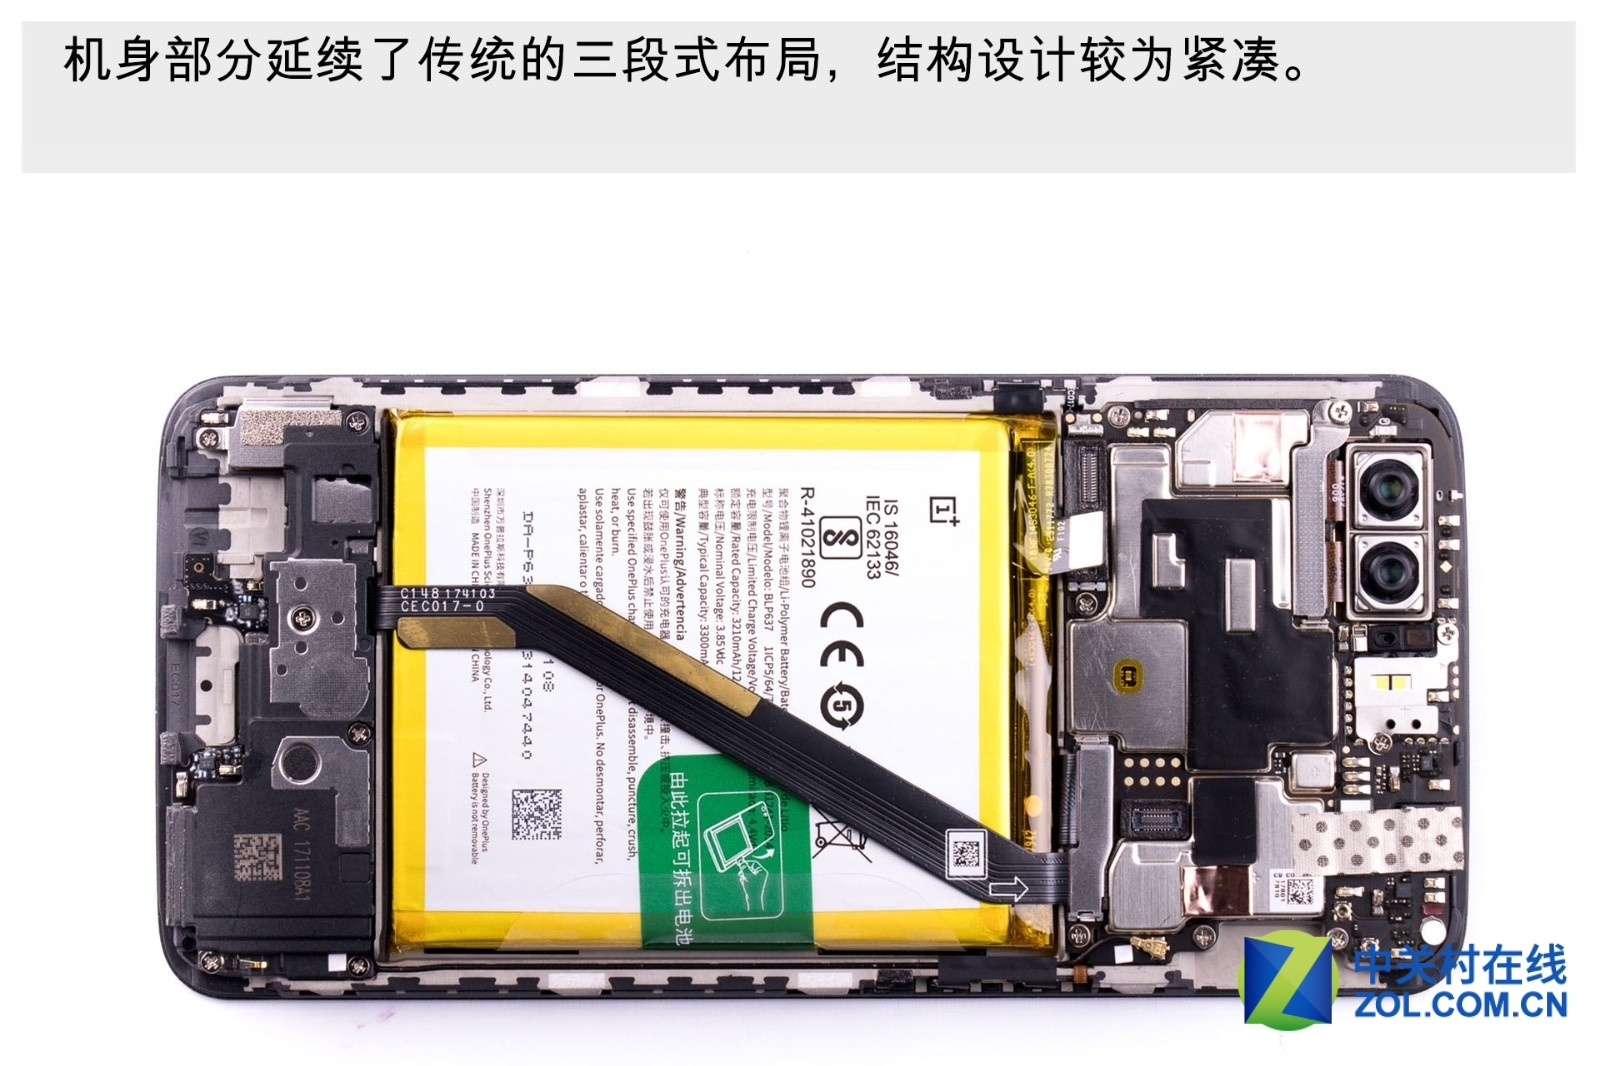 OnePlus 5T Teardown - MyFixGuide.com